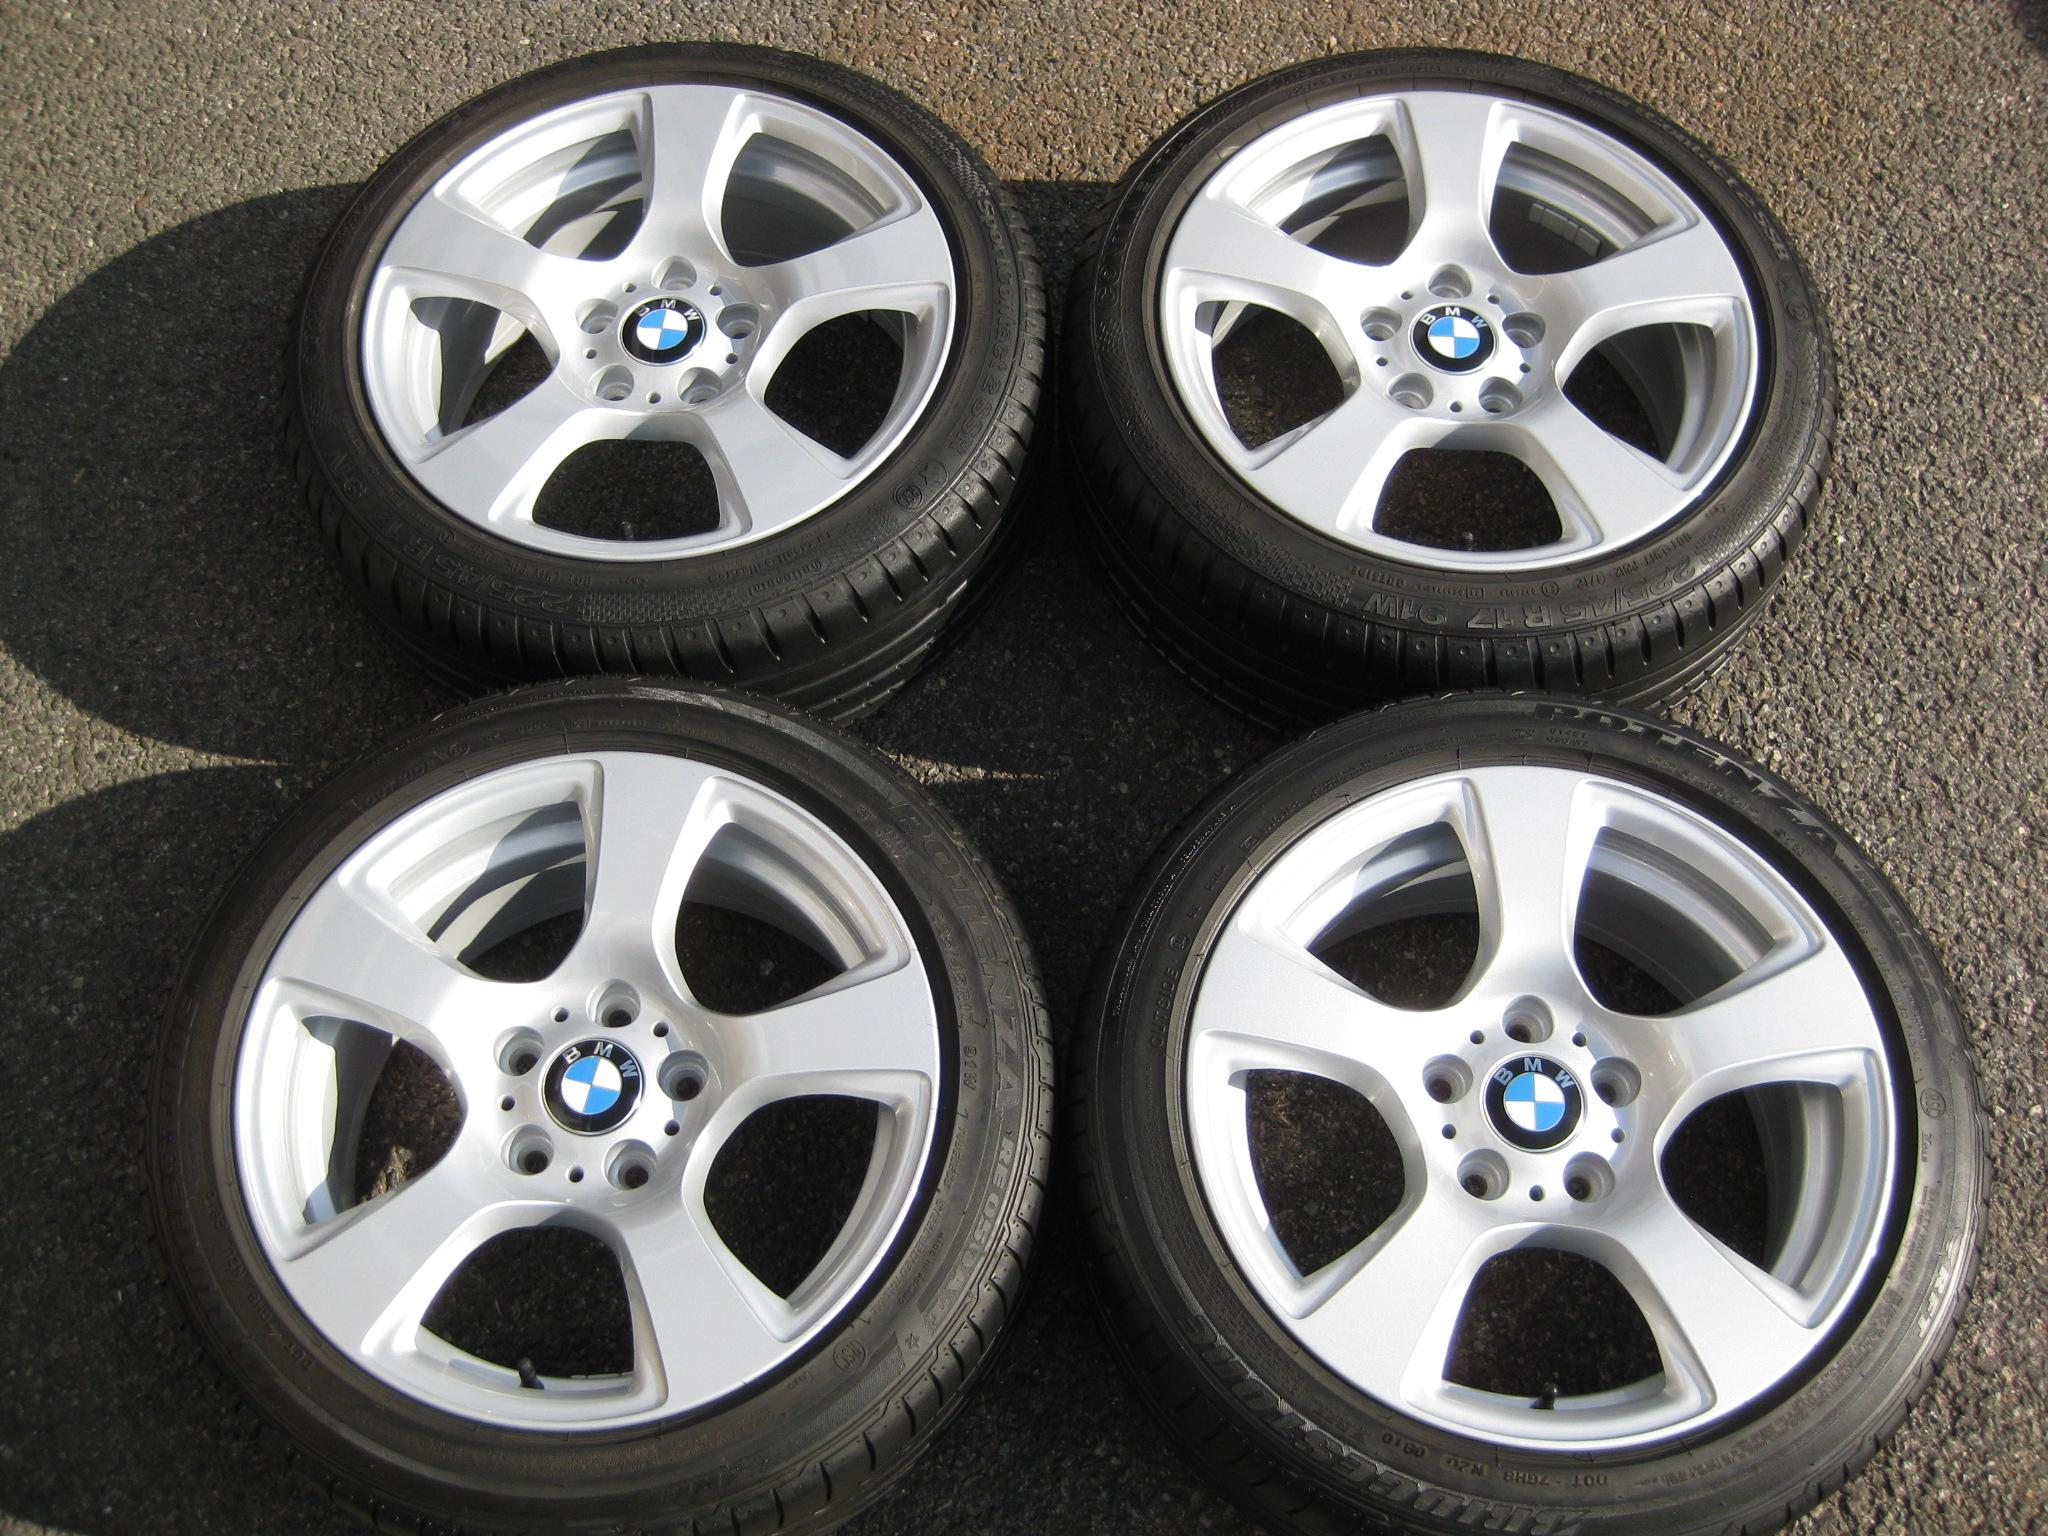 Used 17 Quot Genuine Style 157 E92 5 Spoke Alloys Fully Refurbed Inc Runflats Bm Autosport Ltd